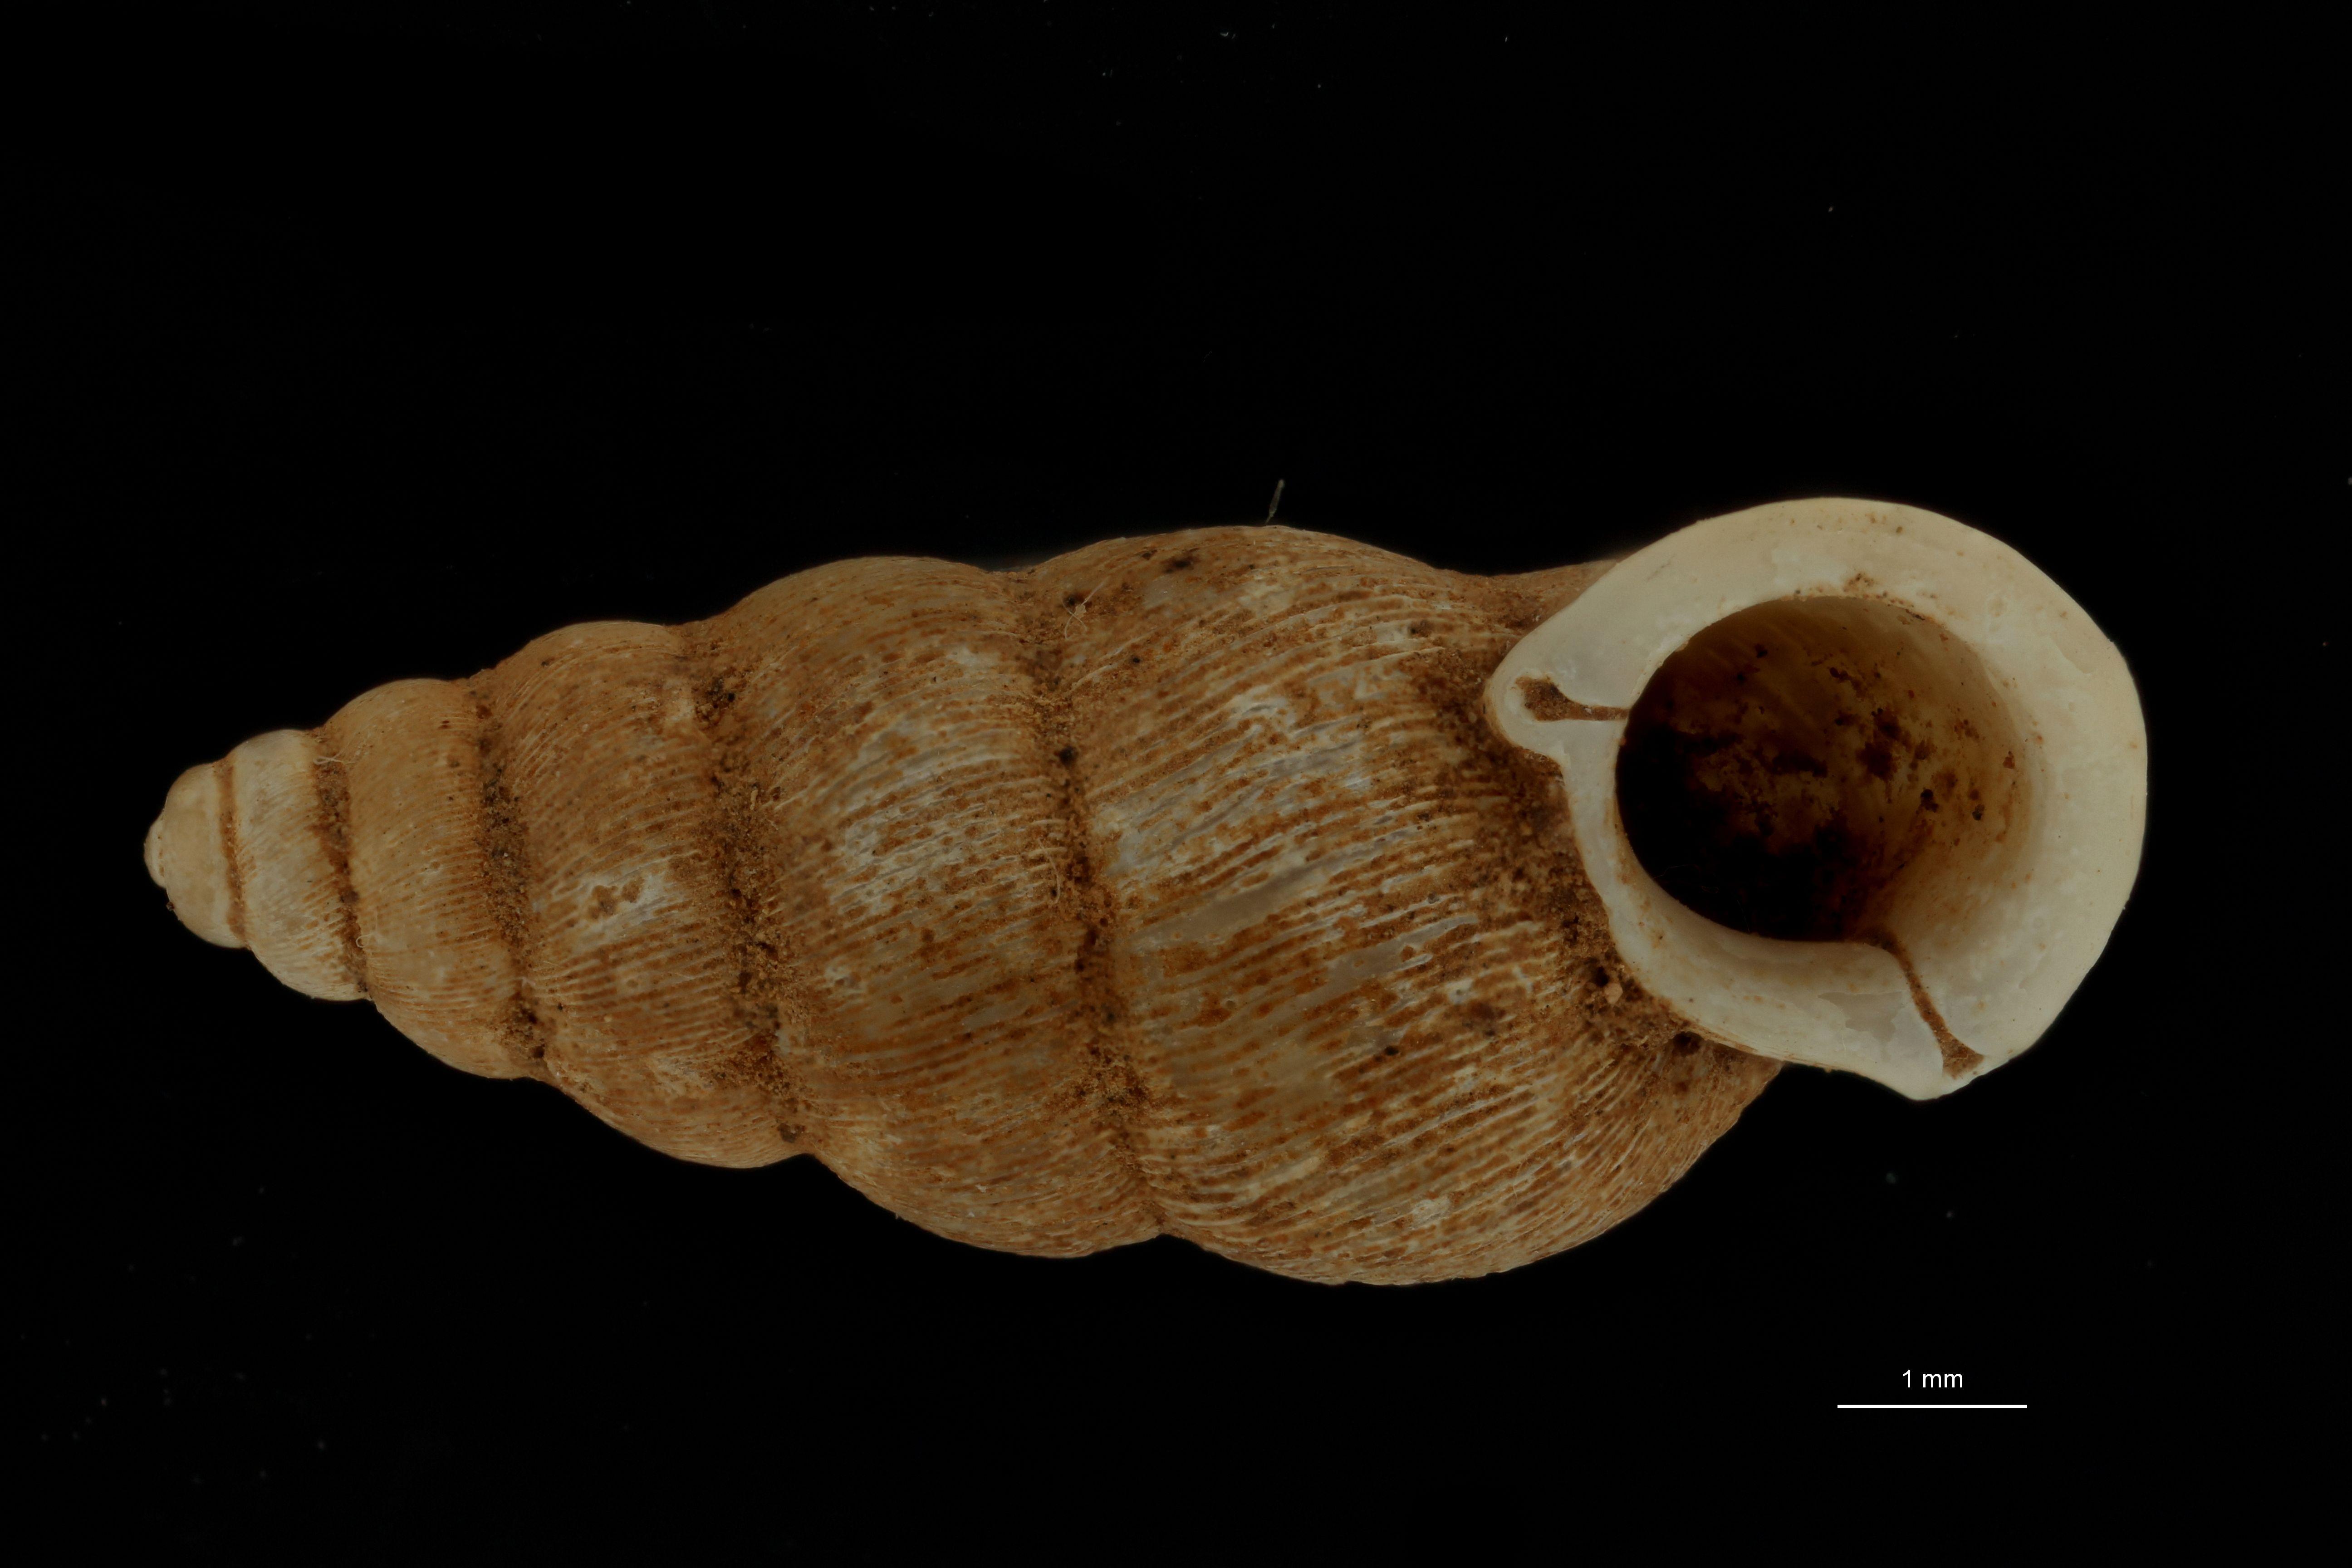 BE-RBINS-INV PARATYPE MT 953 Pupinella densecostata FRONTALF.jpg